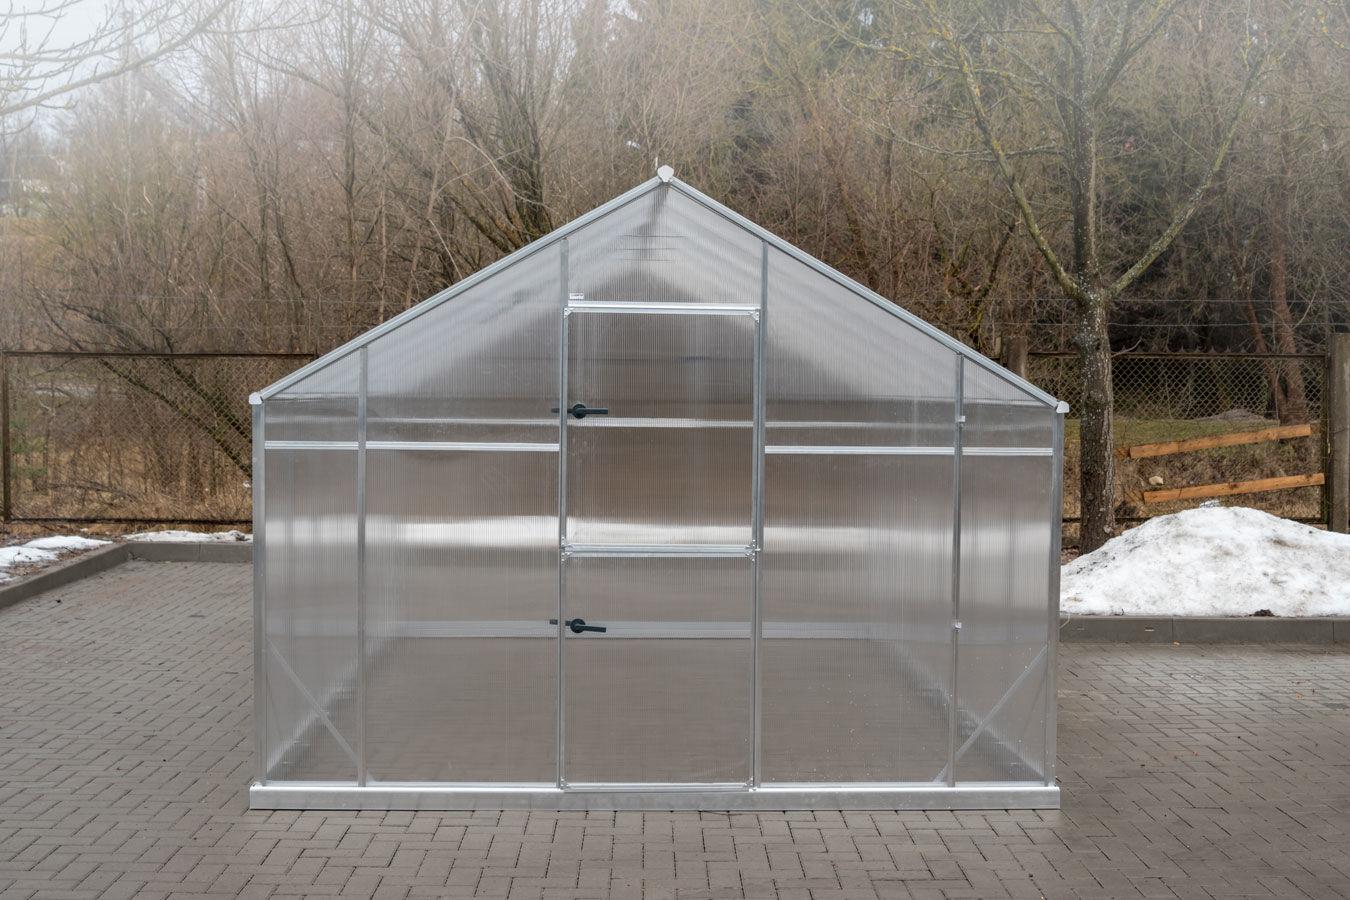 Szklarnia Sanus XL-24 wymiar 2,9x8,5m H=2,25m 24,6m2 poliwęglan 6mm